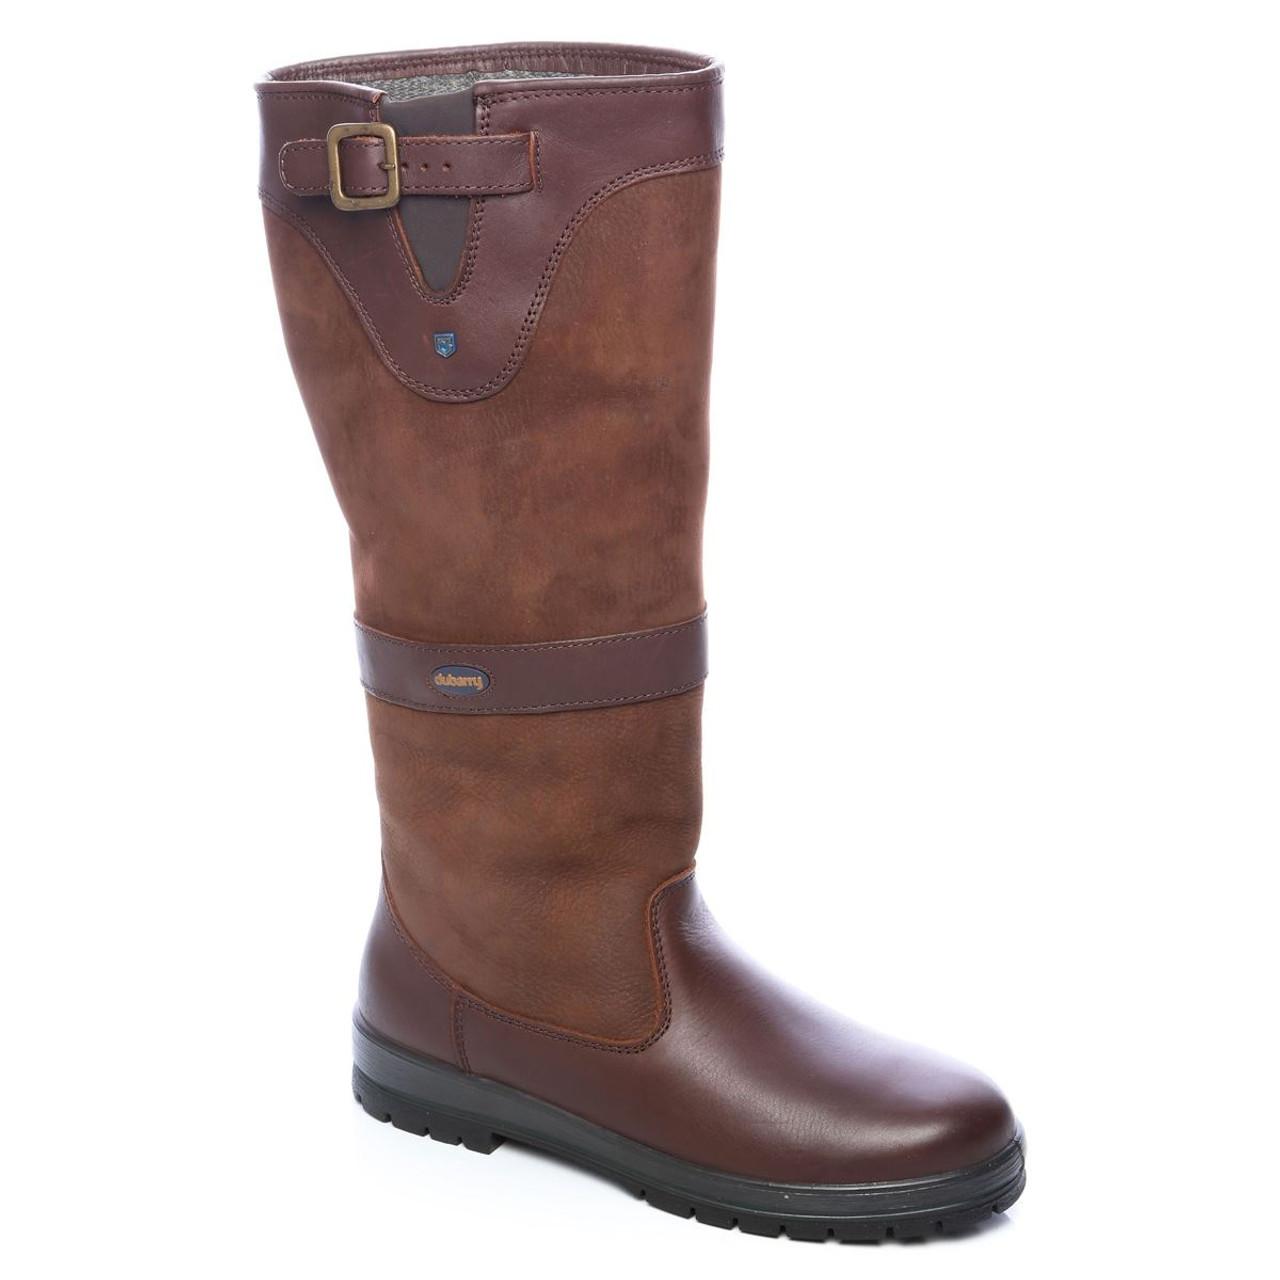 Dubarry Tipperary Boots in Walnut